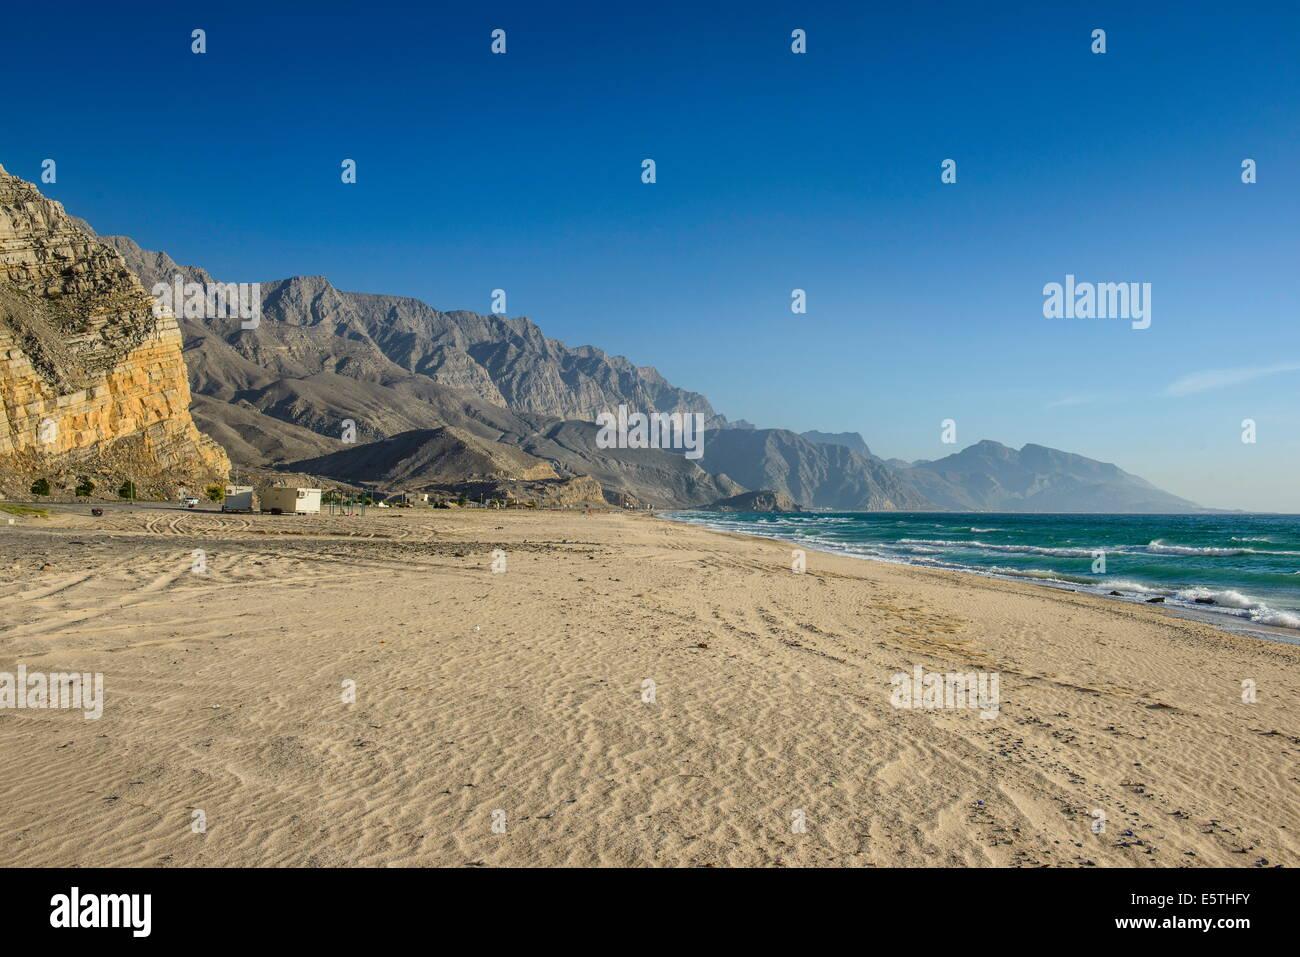 Beautiful beach in Al Jirri, Musandam, Oman, Middle East - Stock Image